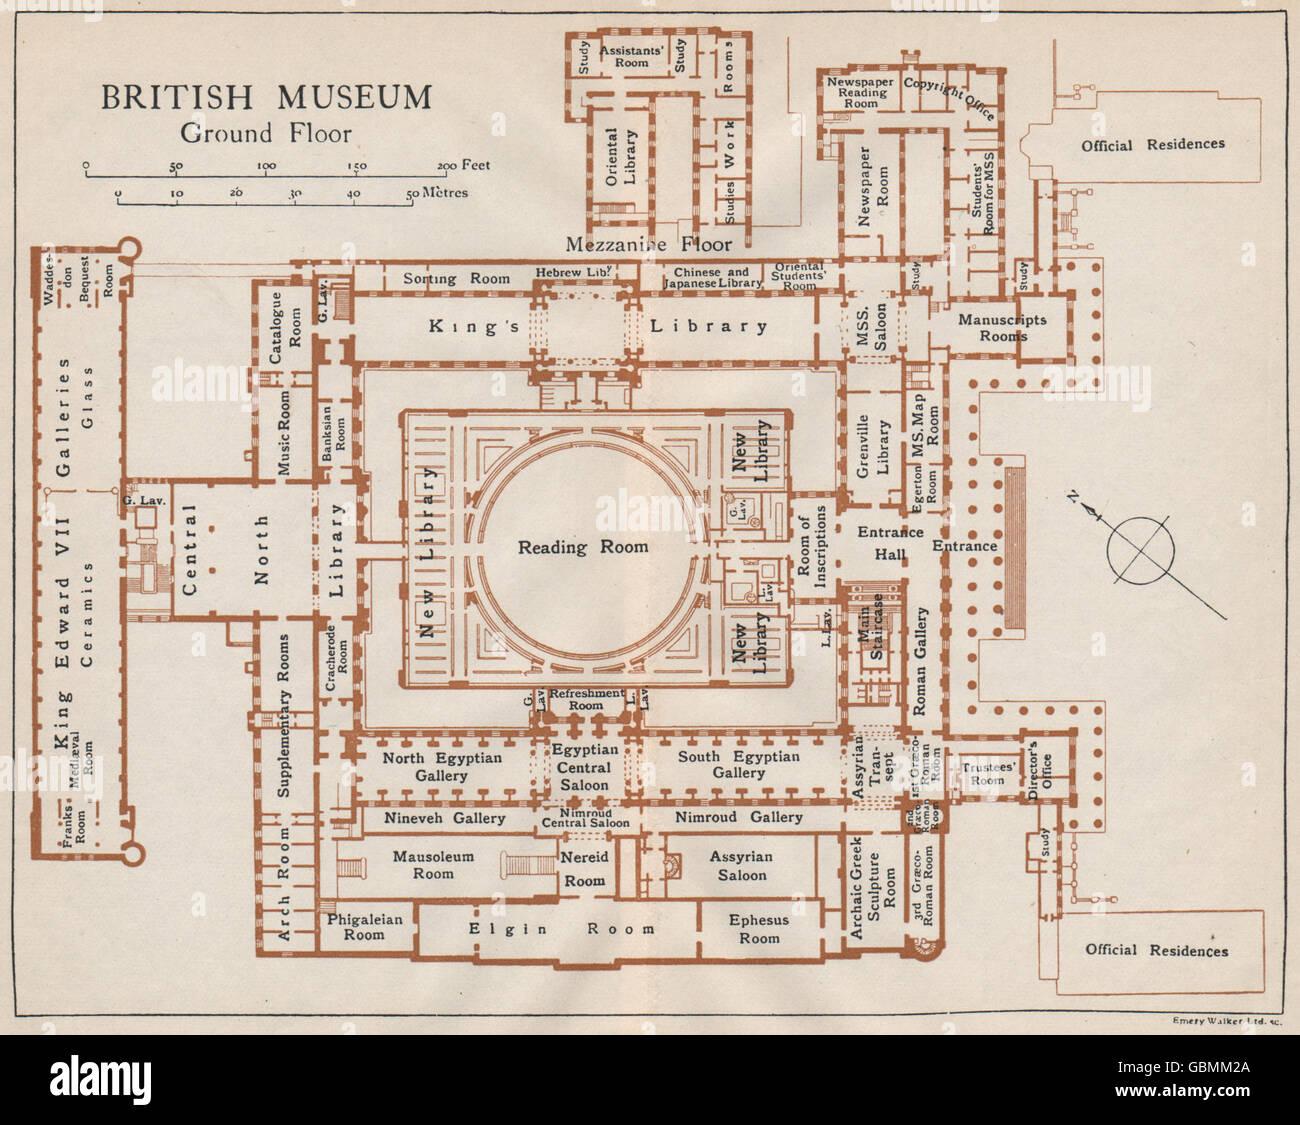 Map British Museum BRITISH MUSEUM. Ground floor vintage map plan. London, 1927 Stock